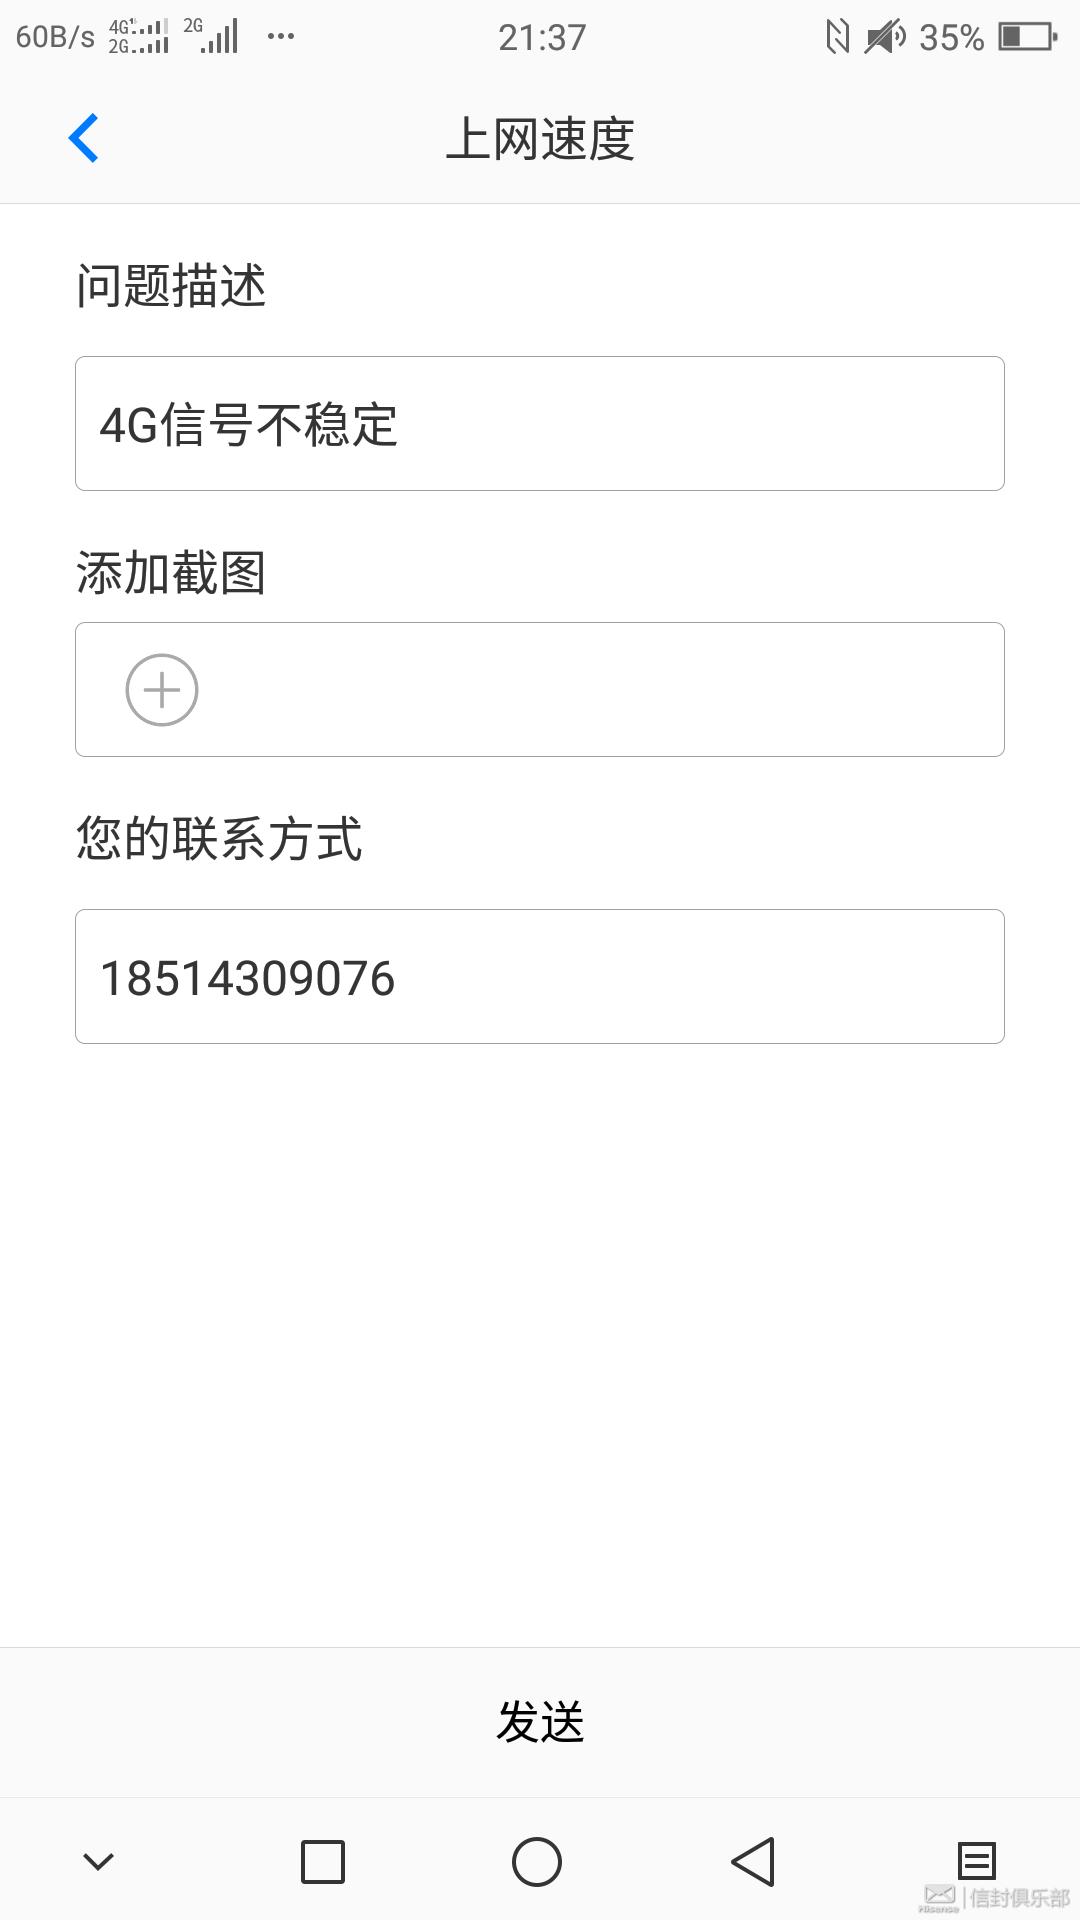 Screenshot_20180113-213709_问题反馈.png